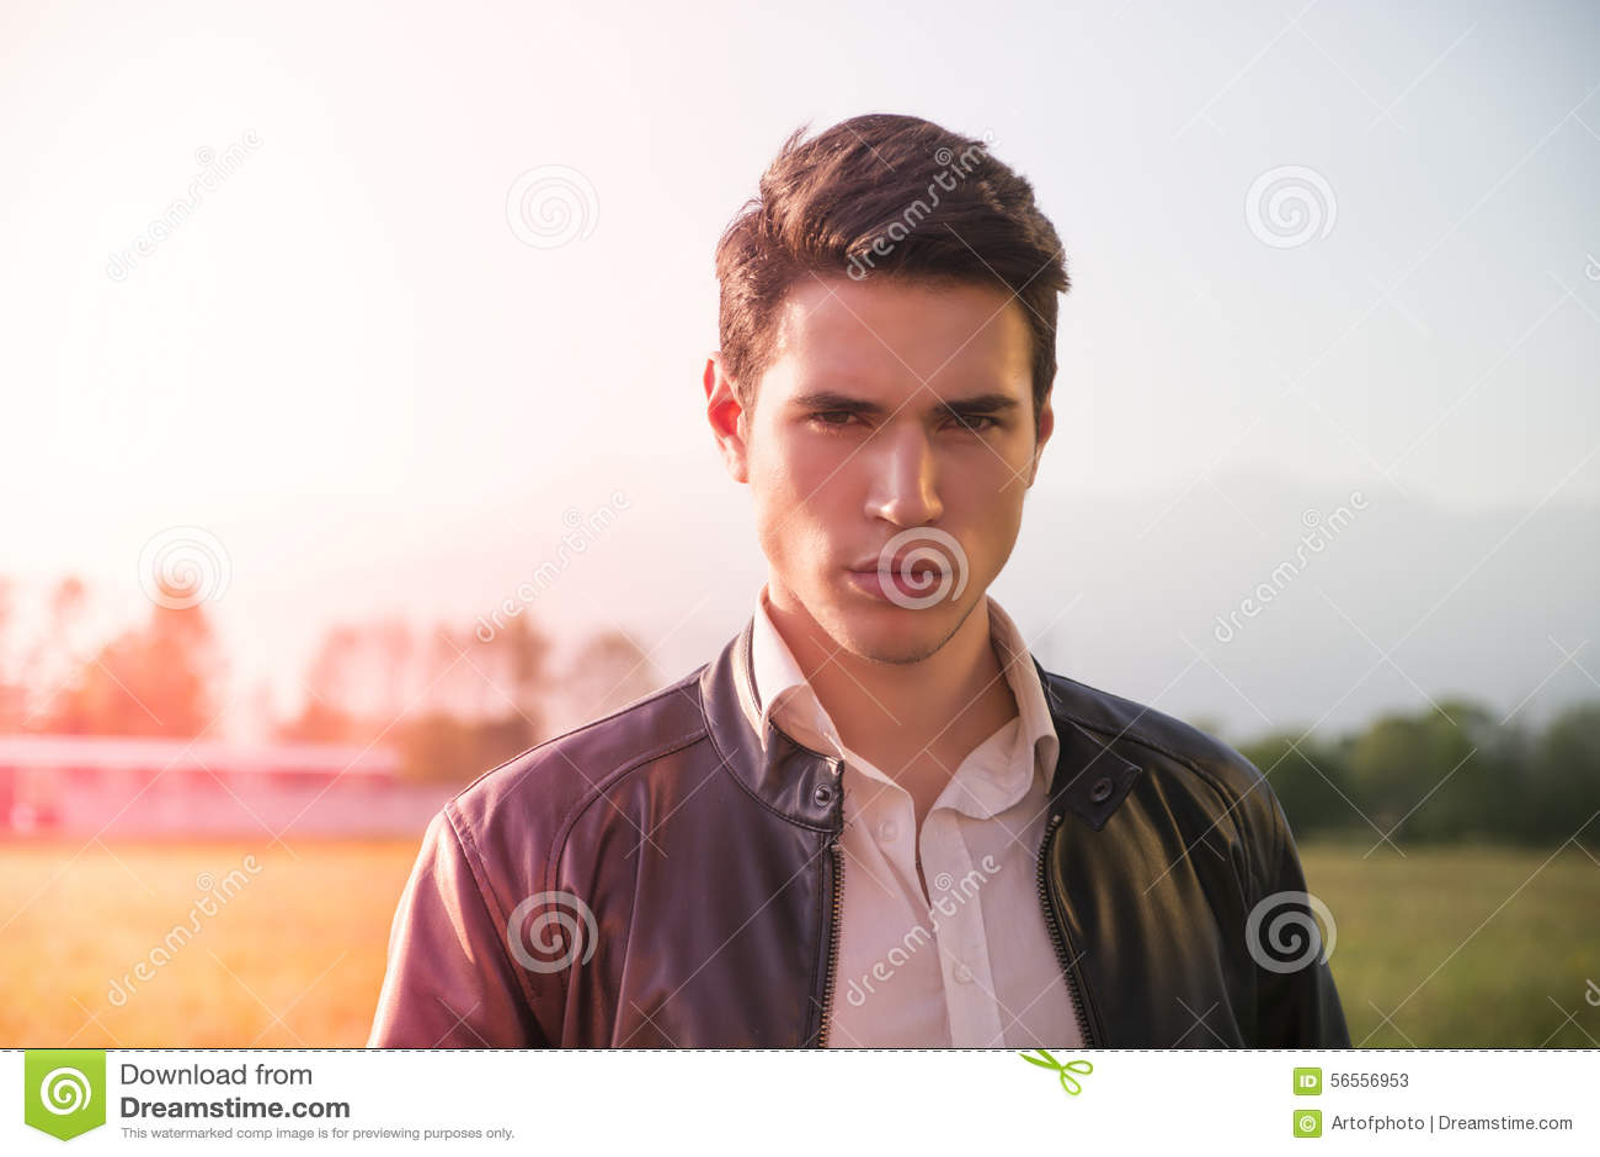 Download Όμορφος νεαρός άνδρας στην επαρχία, μπροστά από Στοκ Εικόνα - εικόνα από τρίχωμα, μοιχαλίδα: 56556953